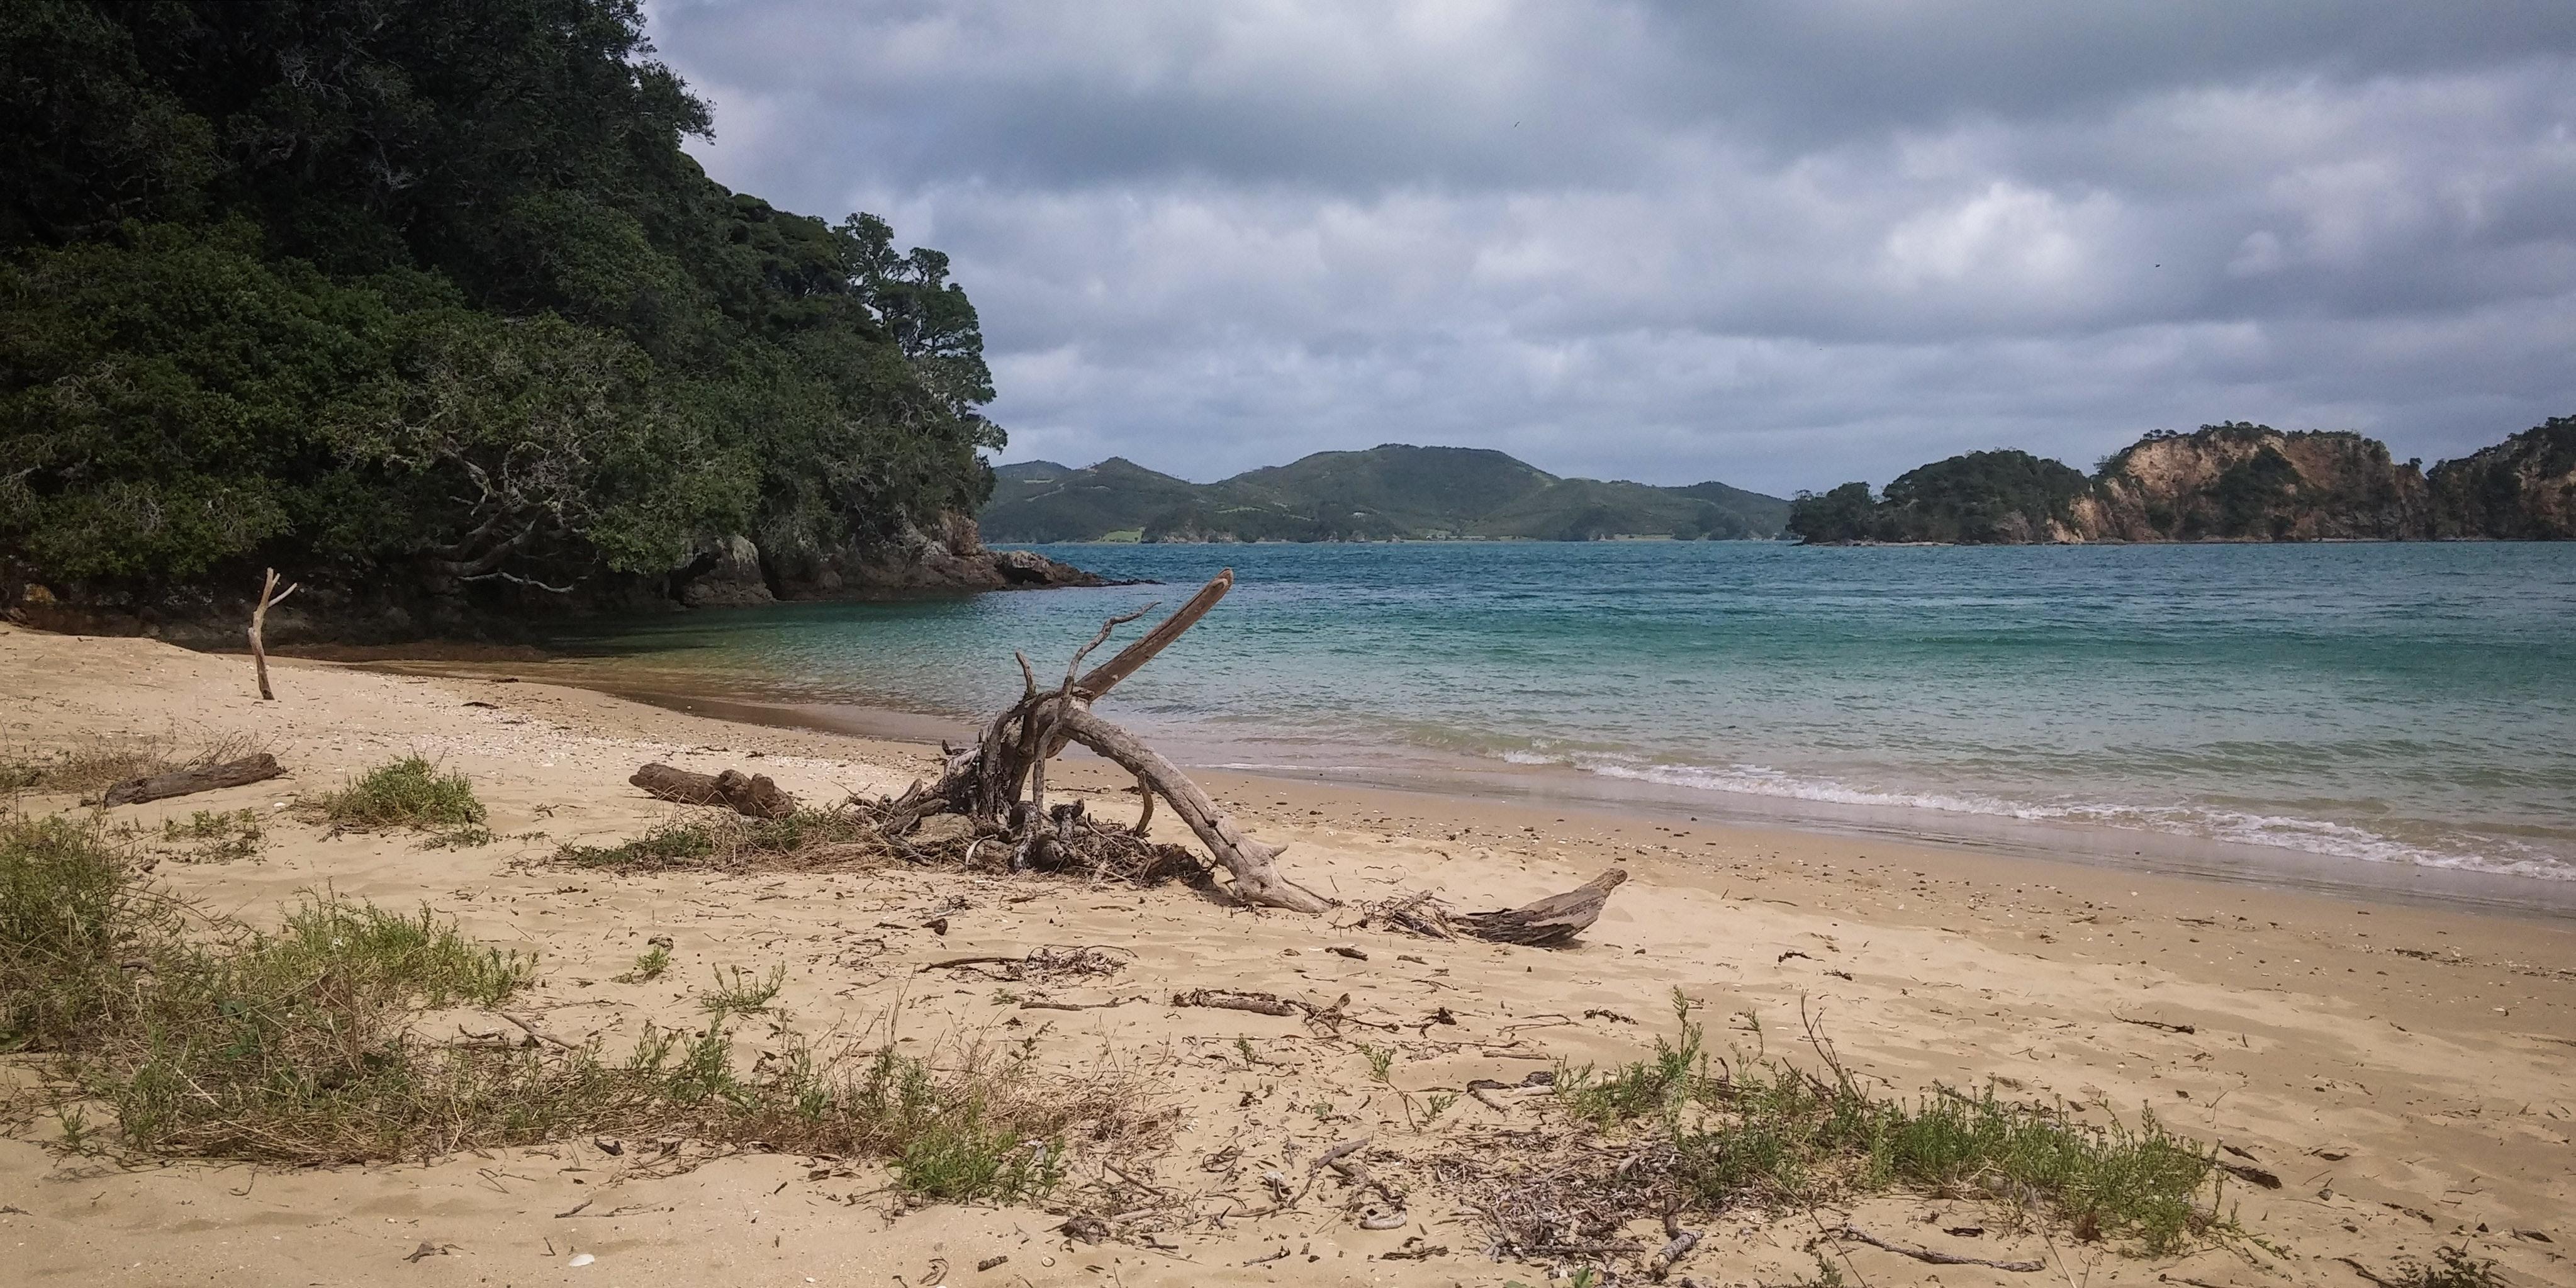 Driftwood on Shore, Summer, Travel, Sky, Seascape, HQ Photo